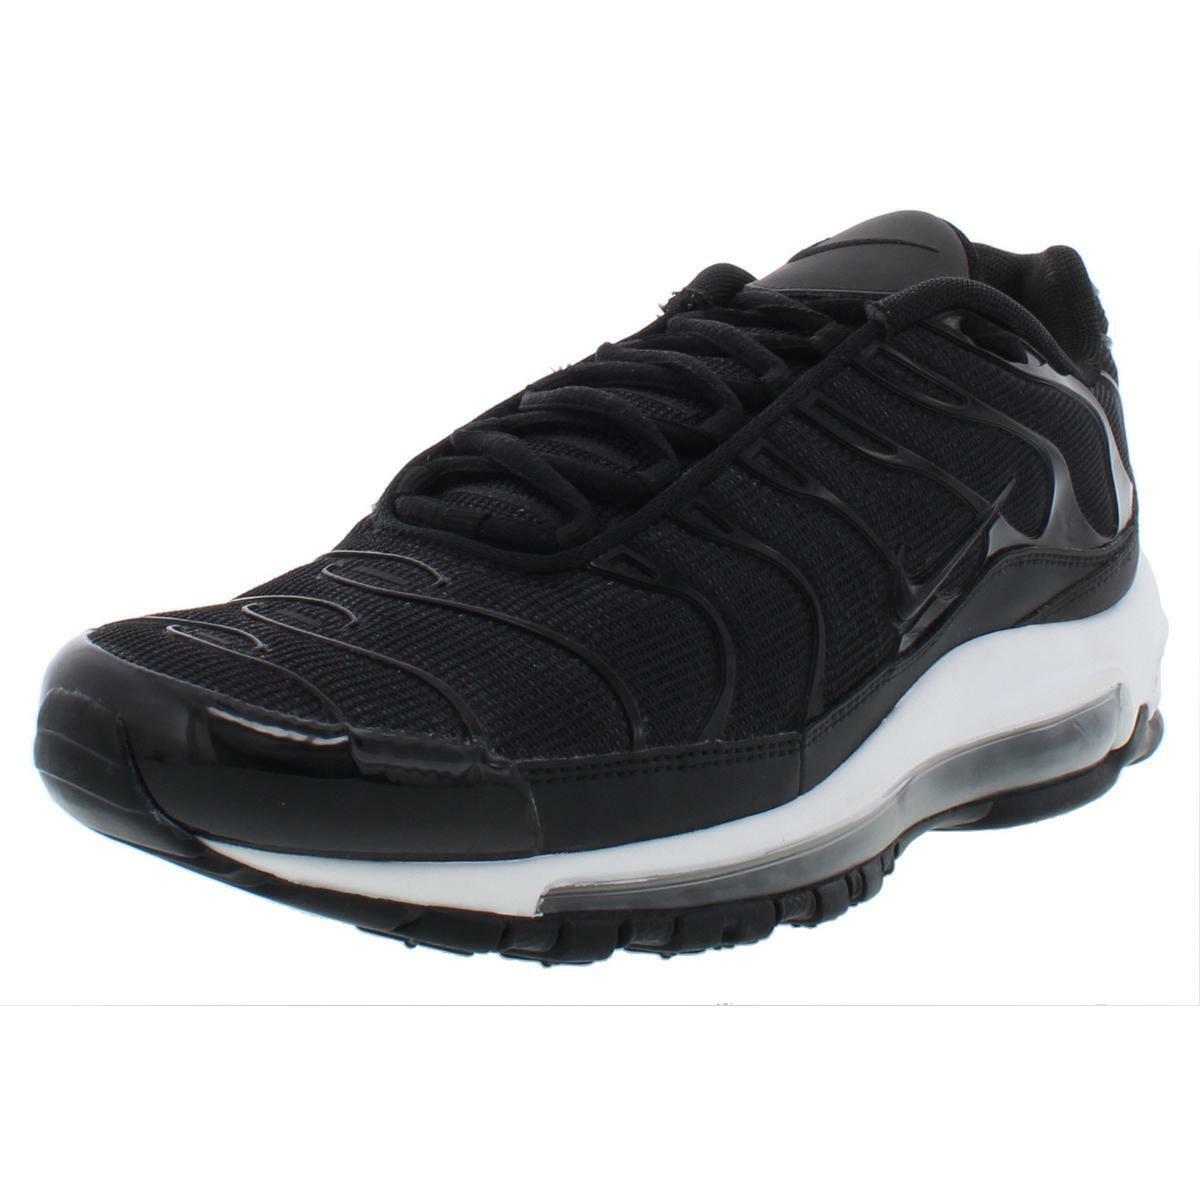 Nike Homme Air Max 97 plus Mesh Running Cross Training chaussures Turnchaussures BHFO 3273